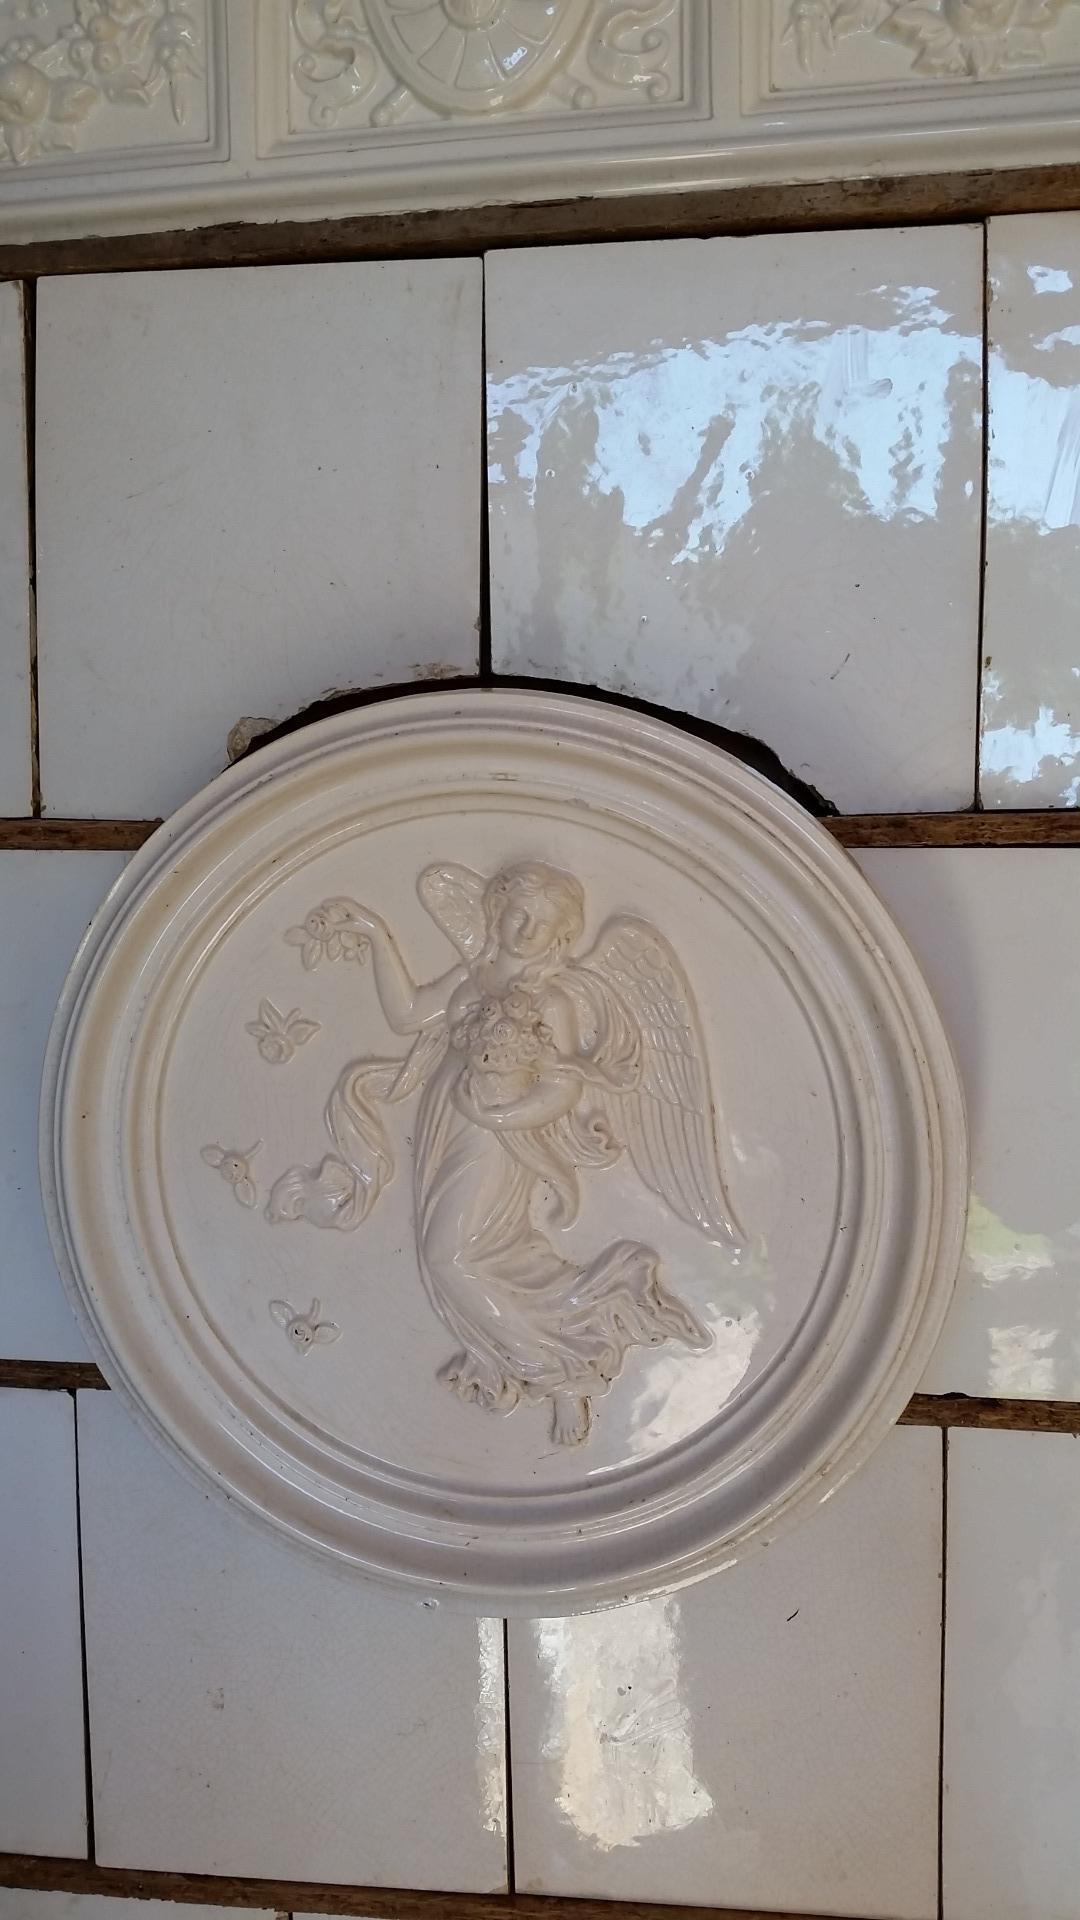 thumb2|Stufa antica bianca angolo, secolo 19, Hardmuth